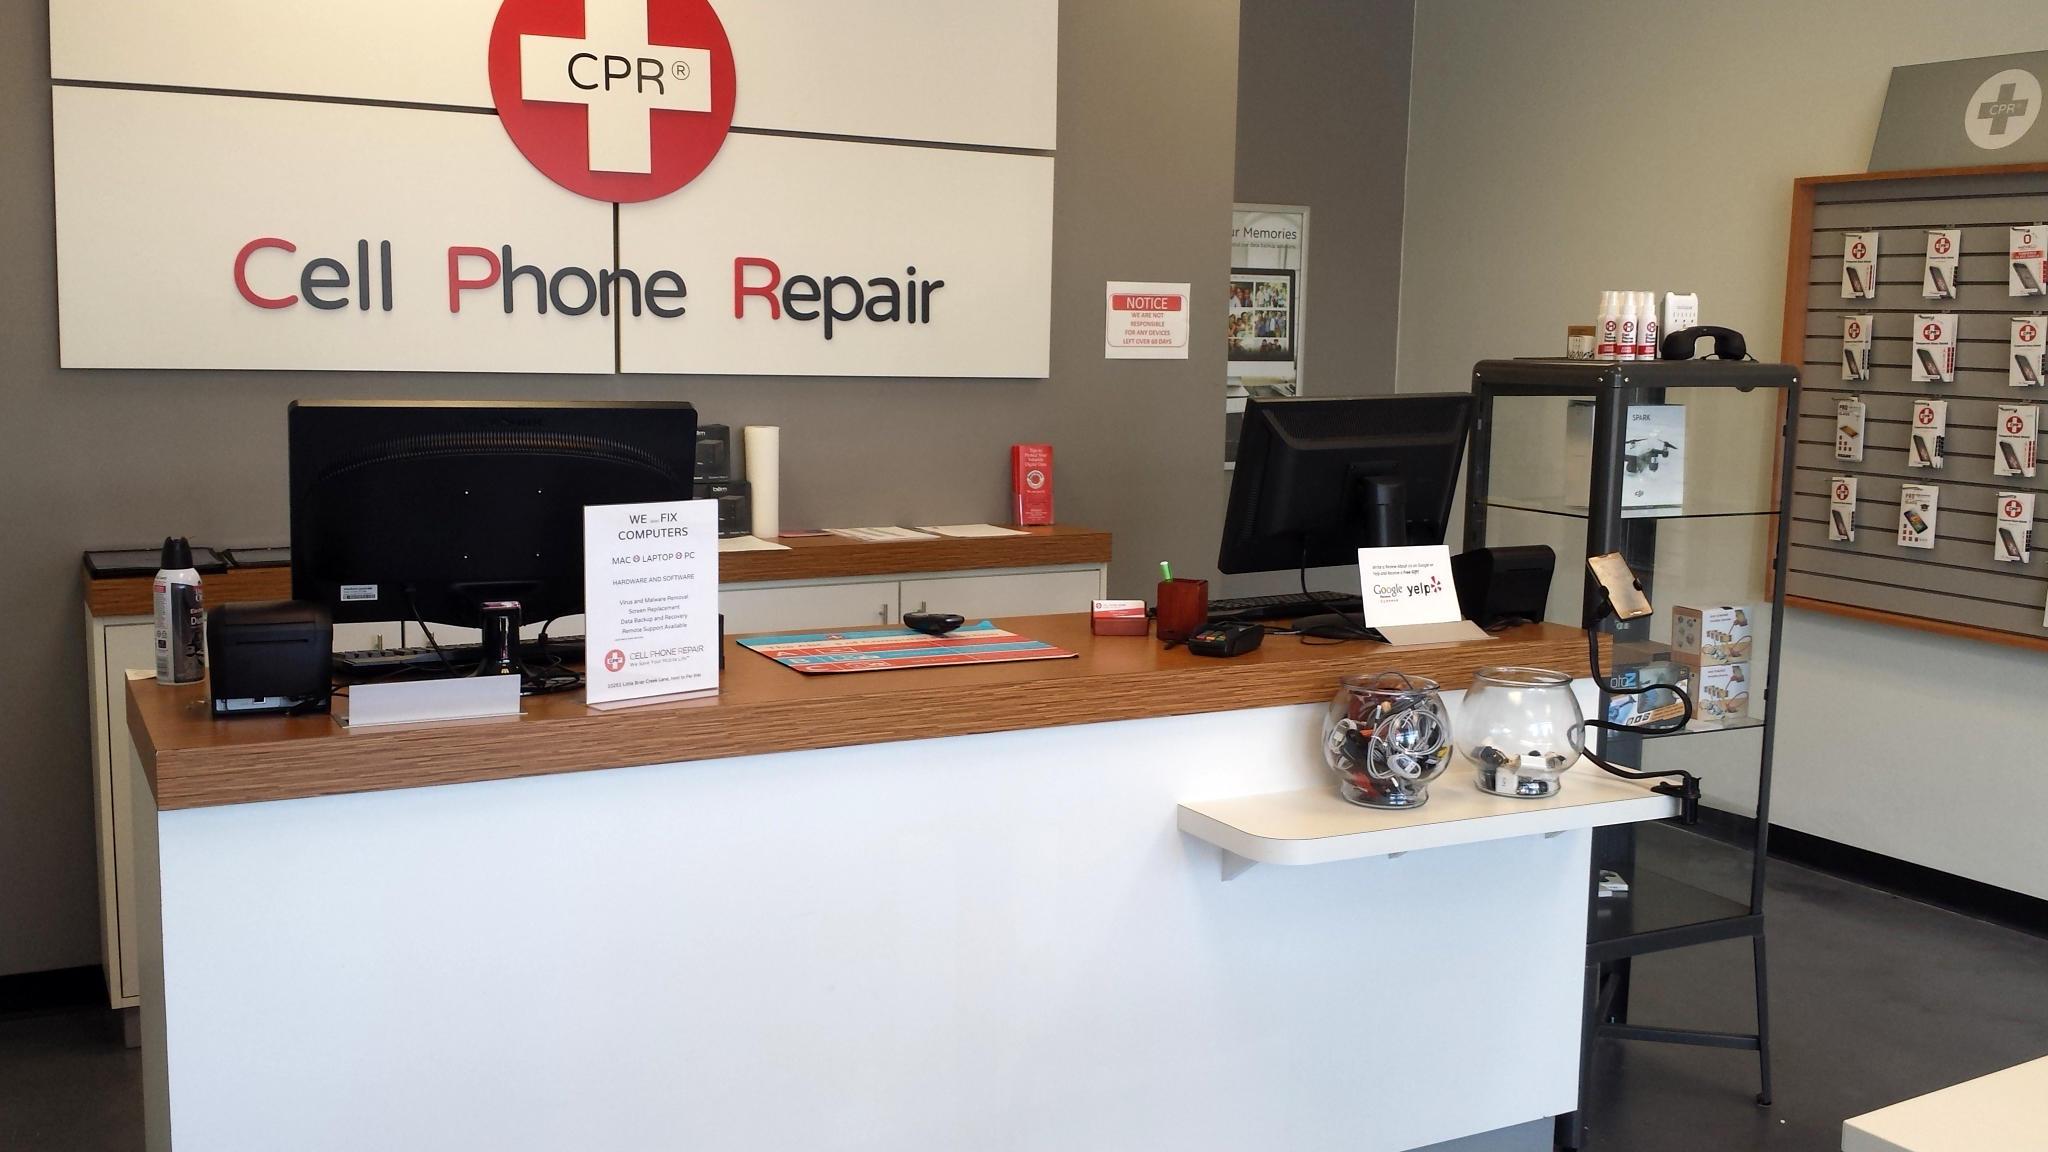 Cpr Cell Phone Repair Raleigh Cell Phone Repair Raleigh Nc 27617